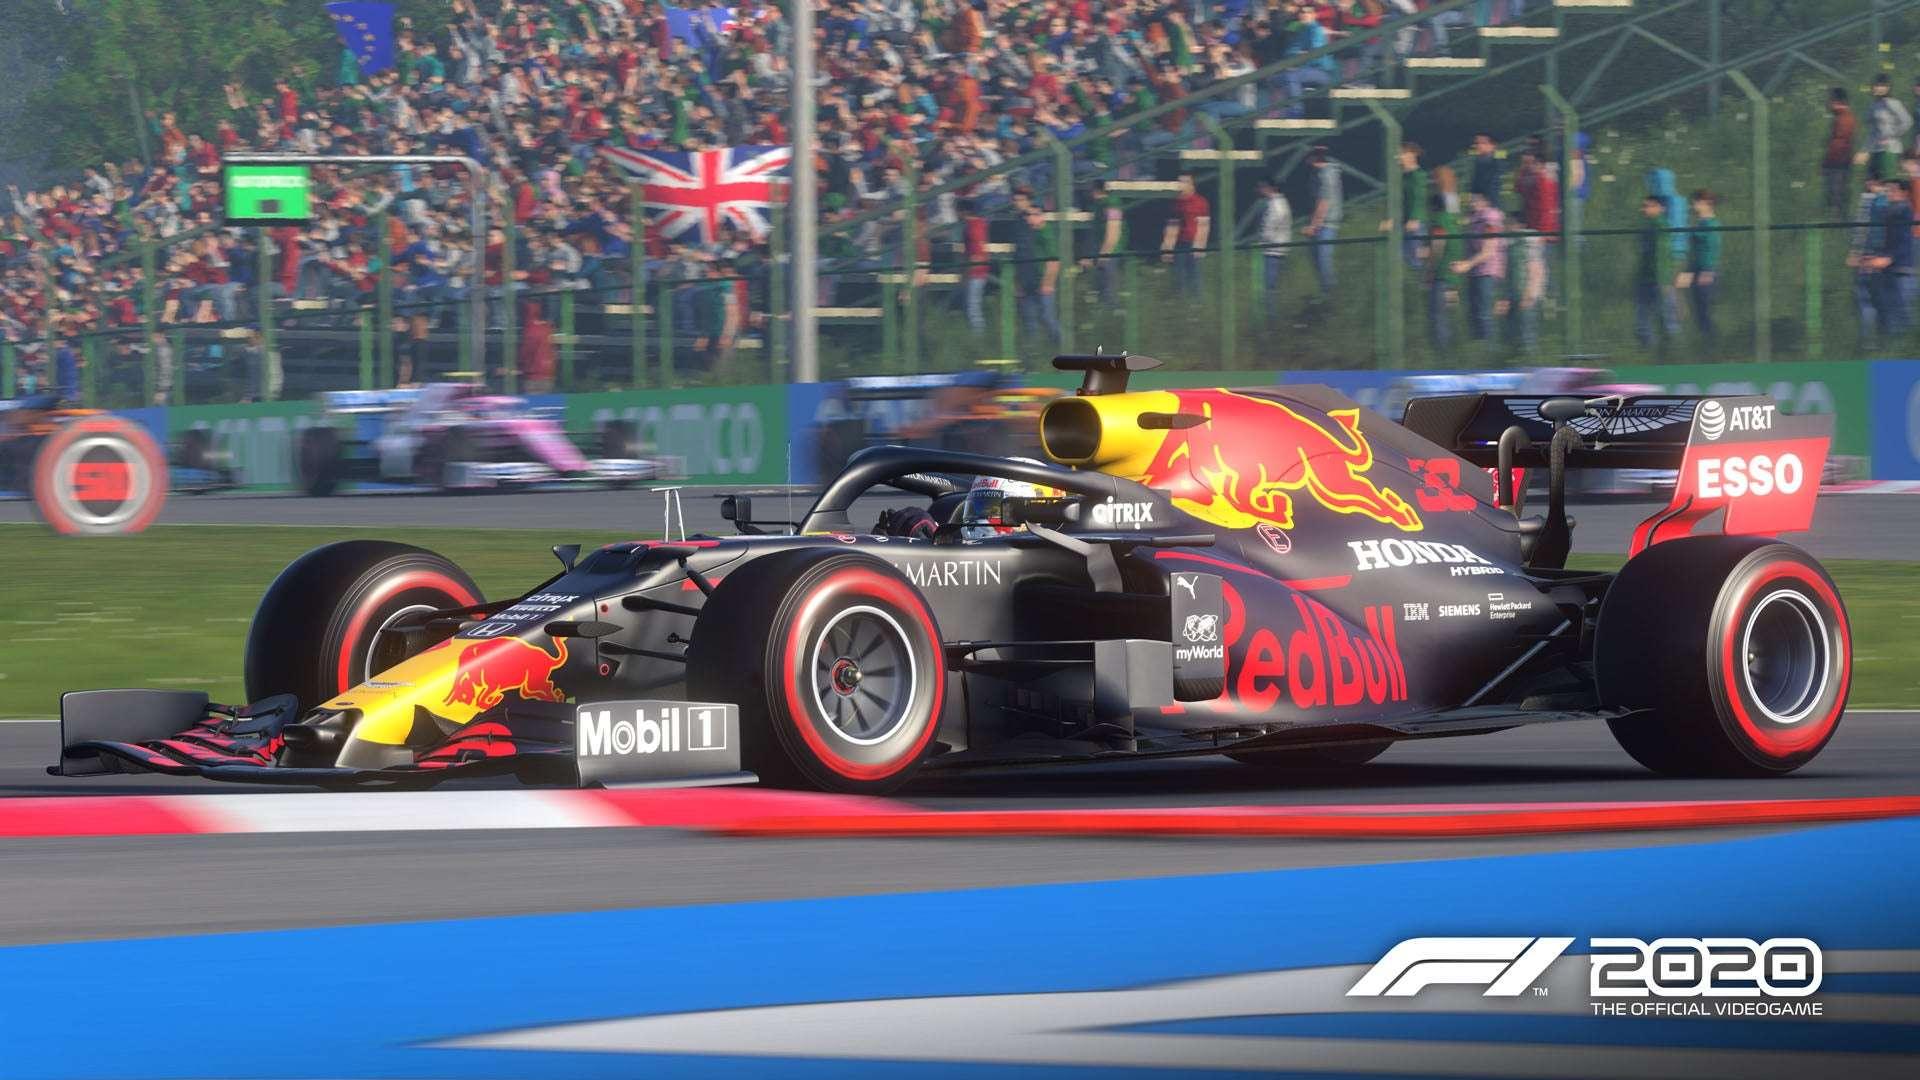 F1 2020 Formula 1 Codemasters Redbull